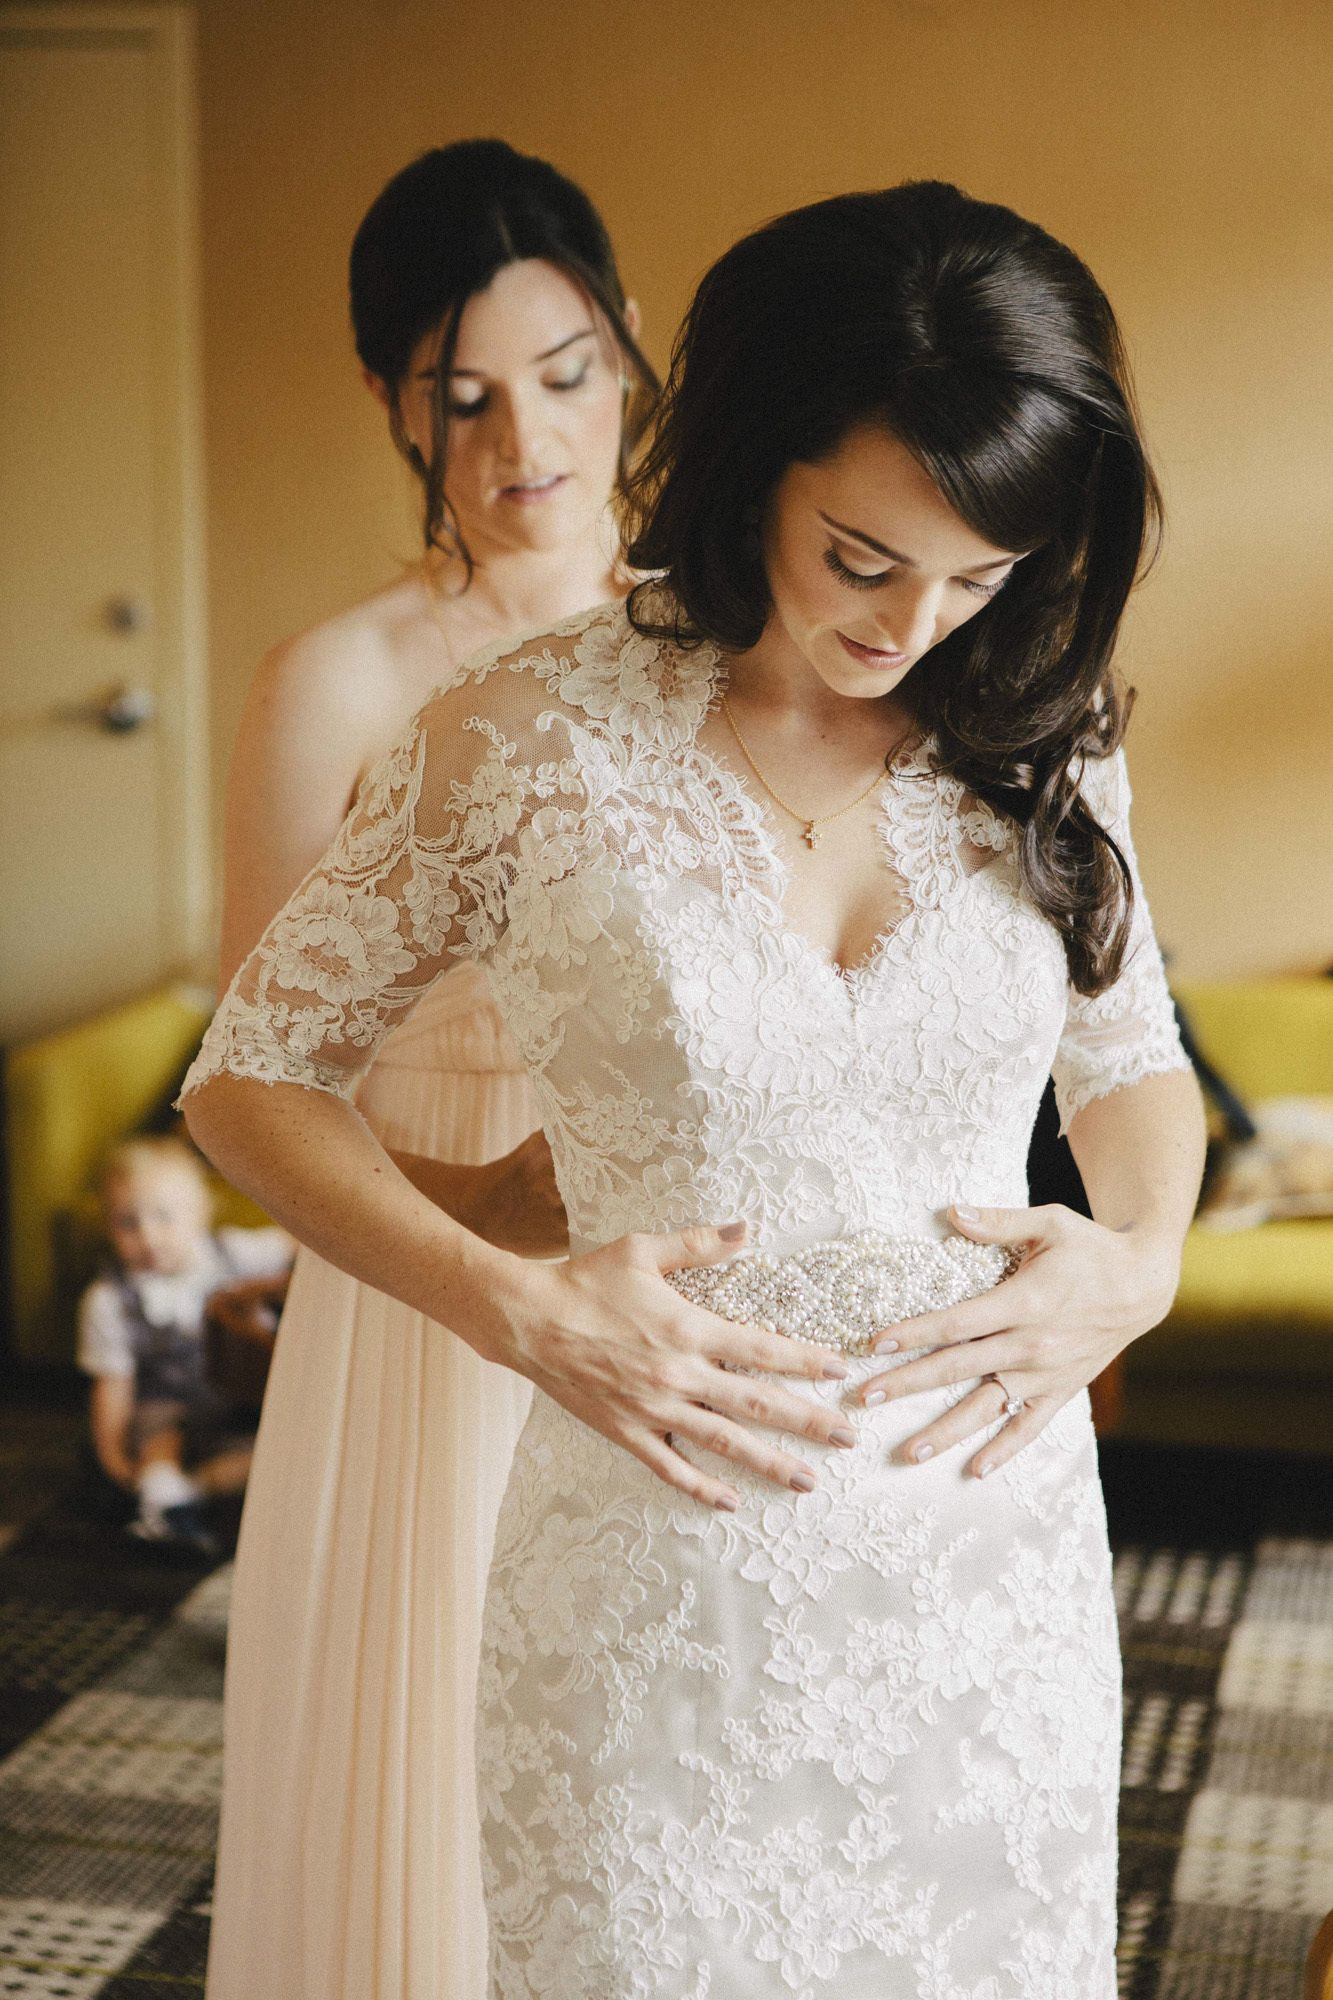 Chicago wedding dresses  Modern Indoor Chicago Wedding  Chicago wedding Lace dress and Chicago